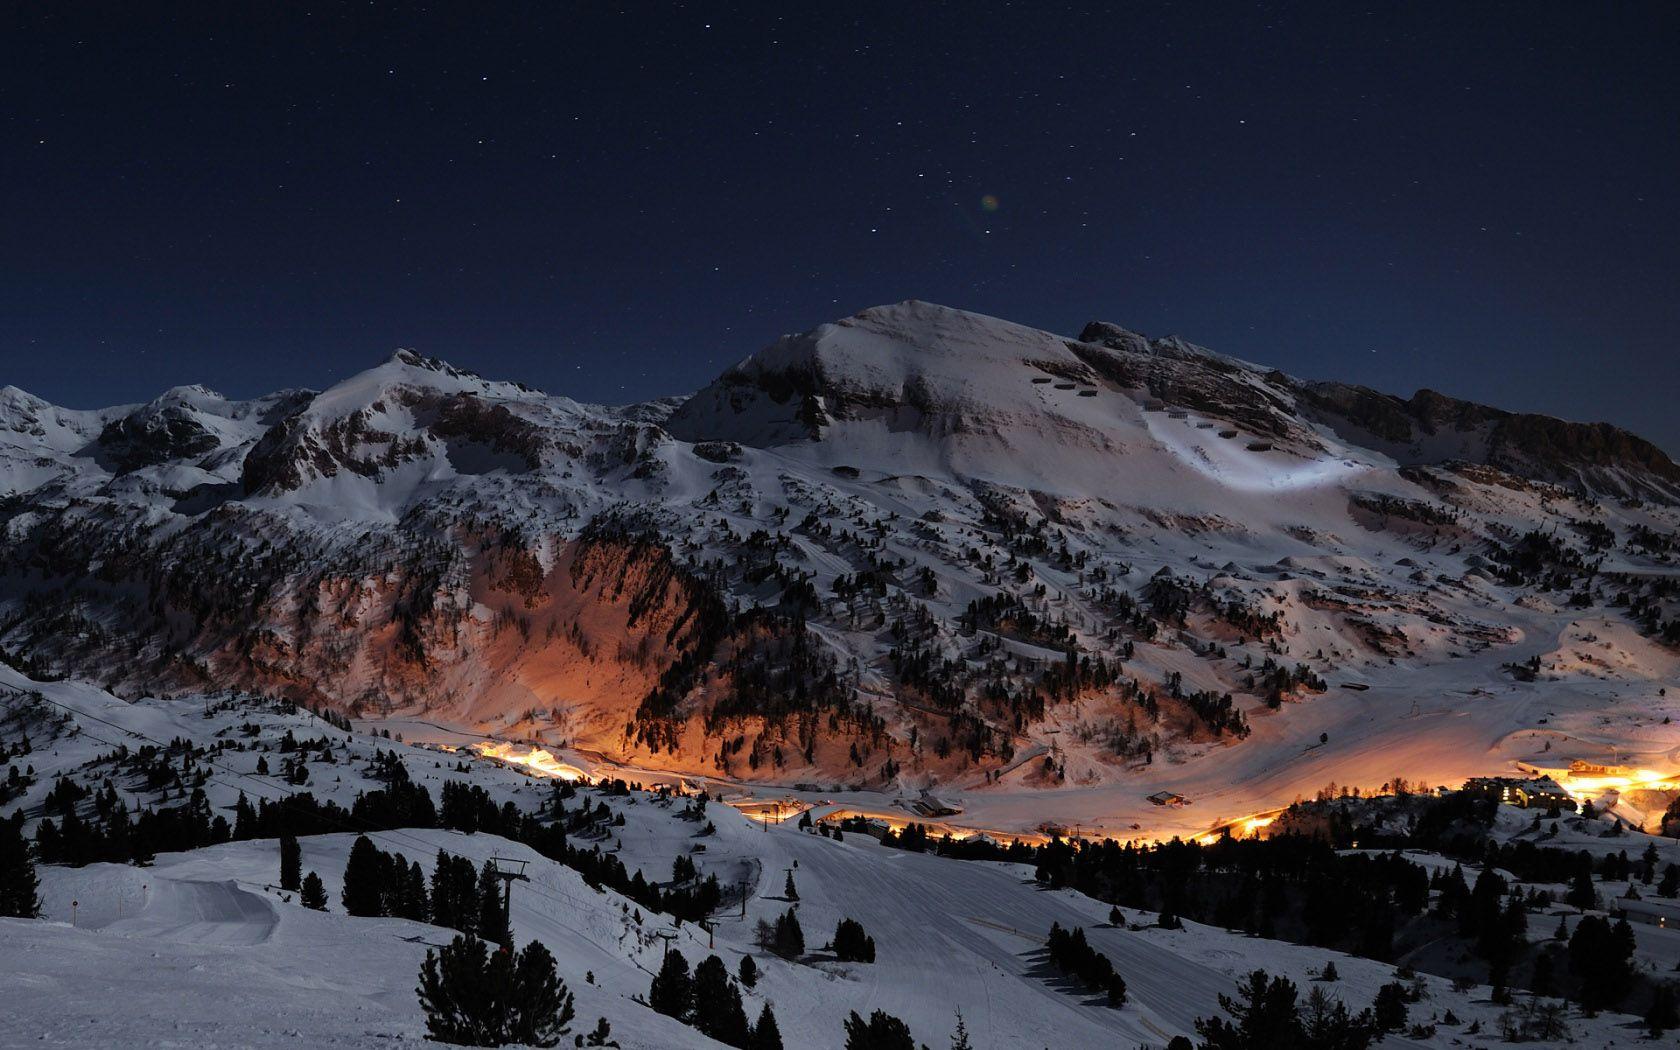 Beautiful Night Ice Mountains HD Wallpaper Wallpapers